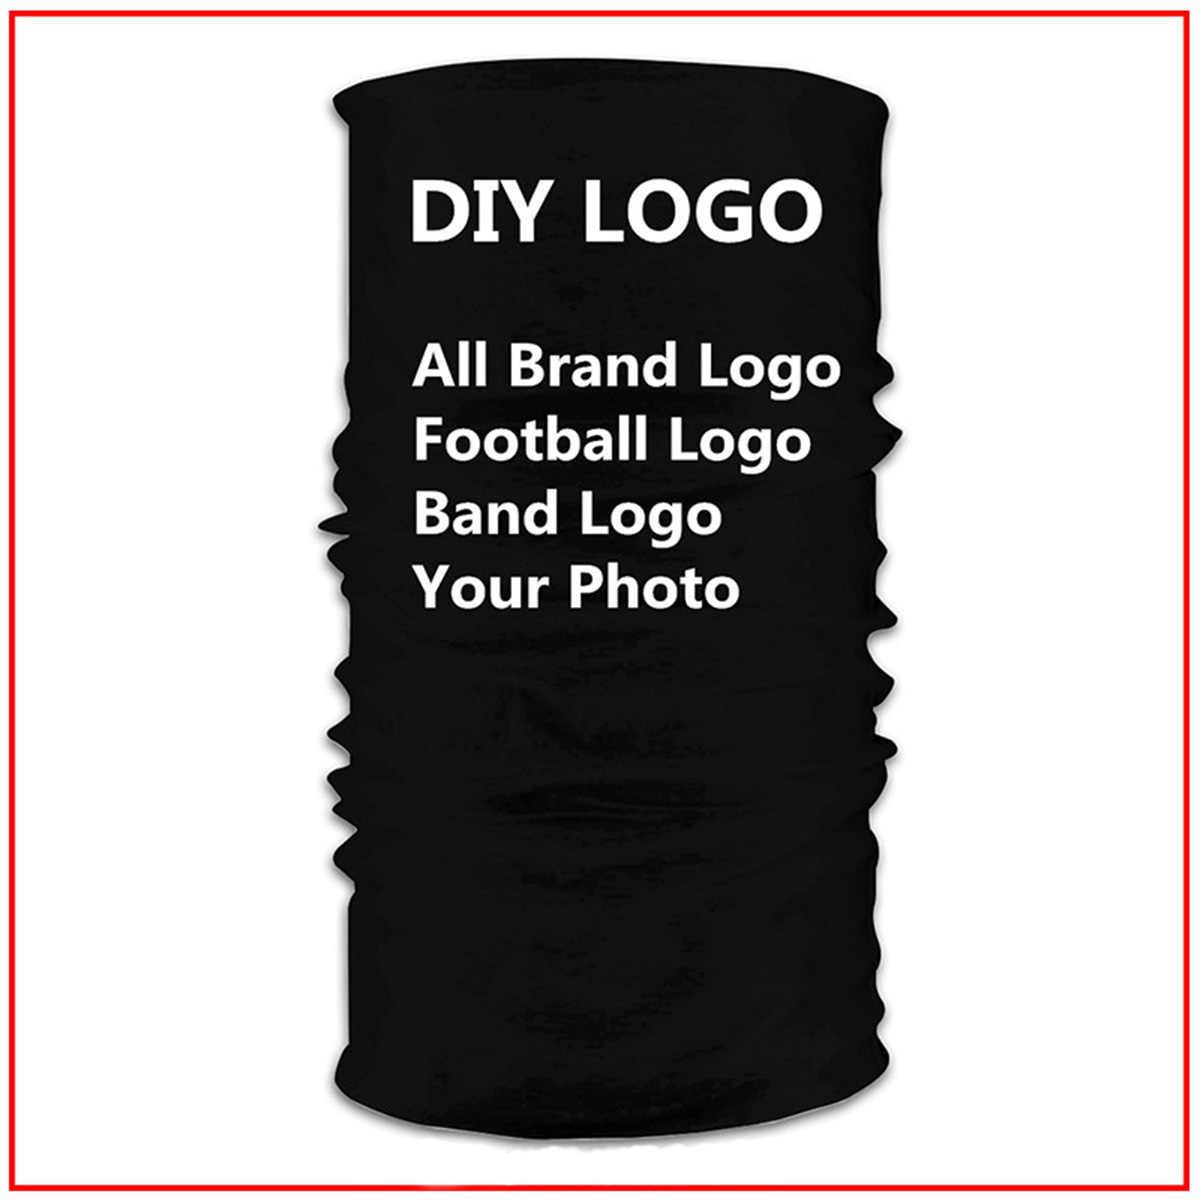 Shaw Brothers Scope Logo Black T-shirt S-5XL Funny Black Vintage Gift Men Women